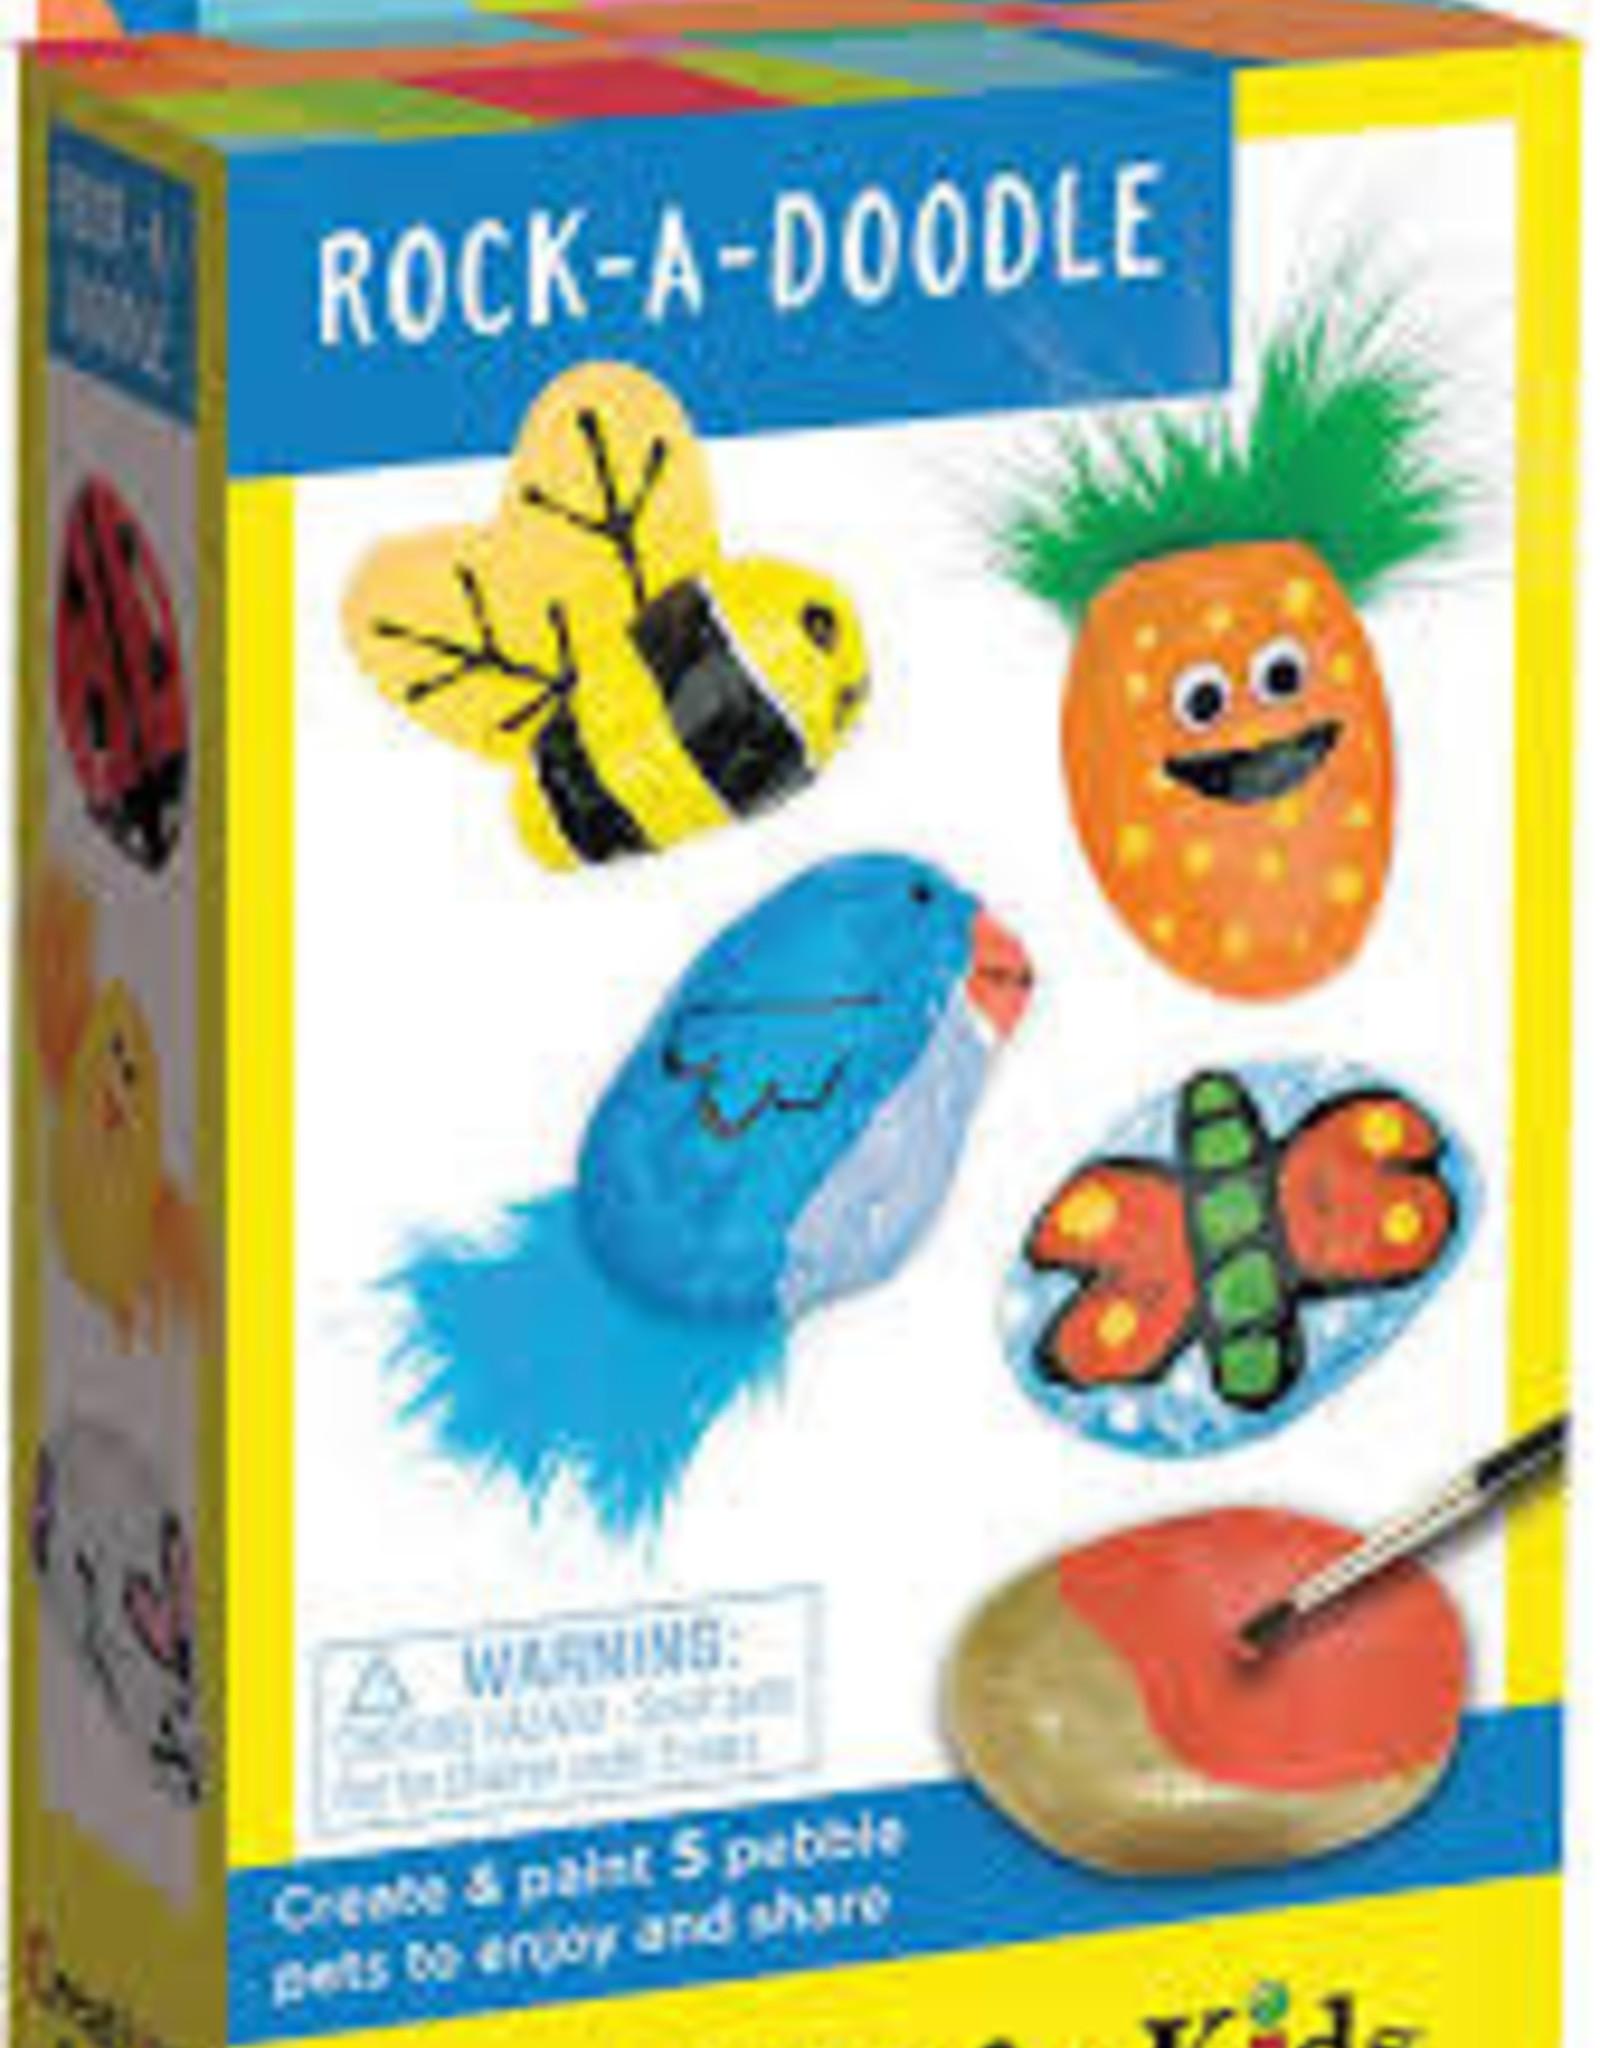 Creativity For Kids Rock-a-Doodle